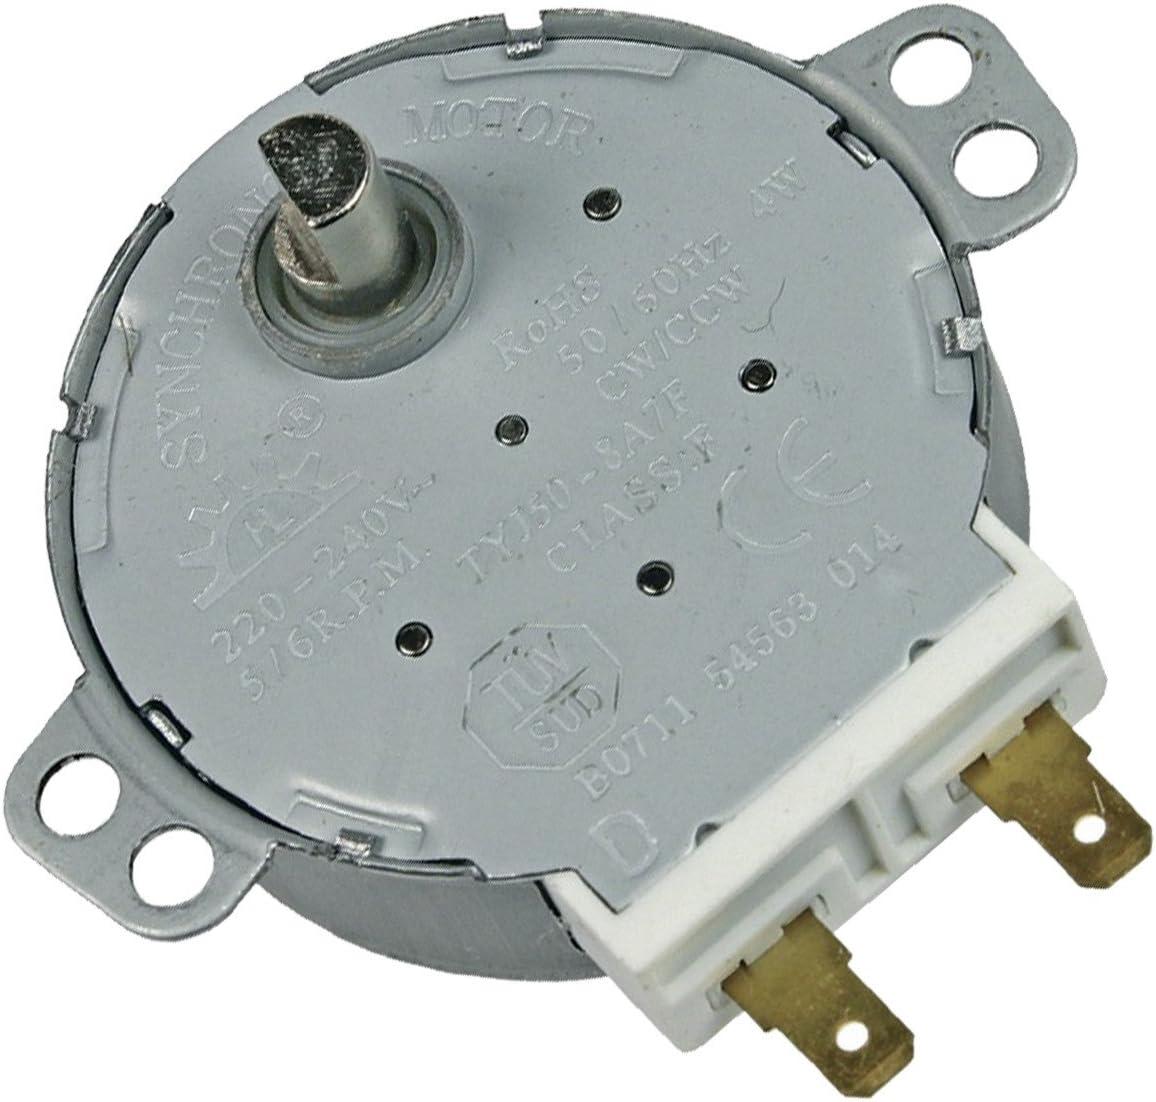 Motor de bandeja giratoria para horno microondas 481067848981, C00313149 Whirlpool IKEA WHIRLPOOL, BAUKNECHT, KITCHENAID, ARISTON HOTPOINT, IGNIS, INDESIT